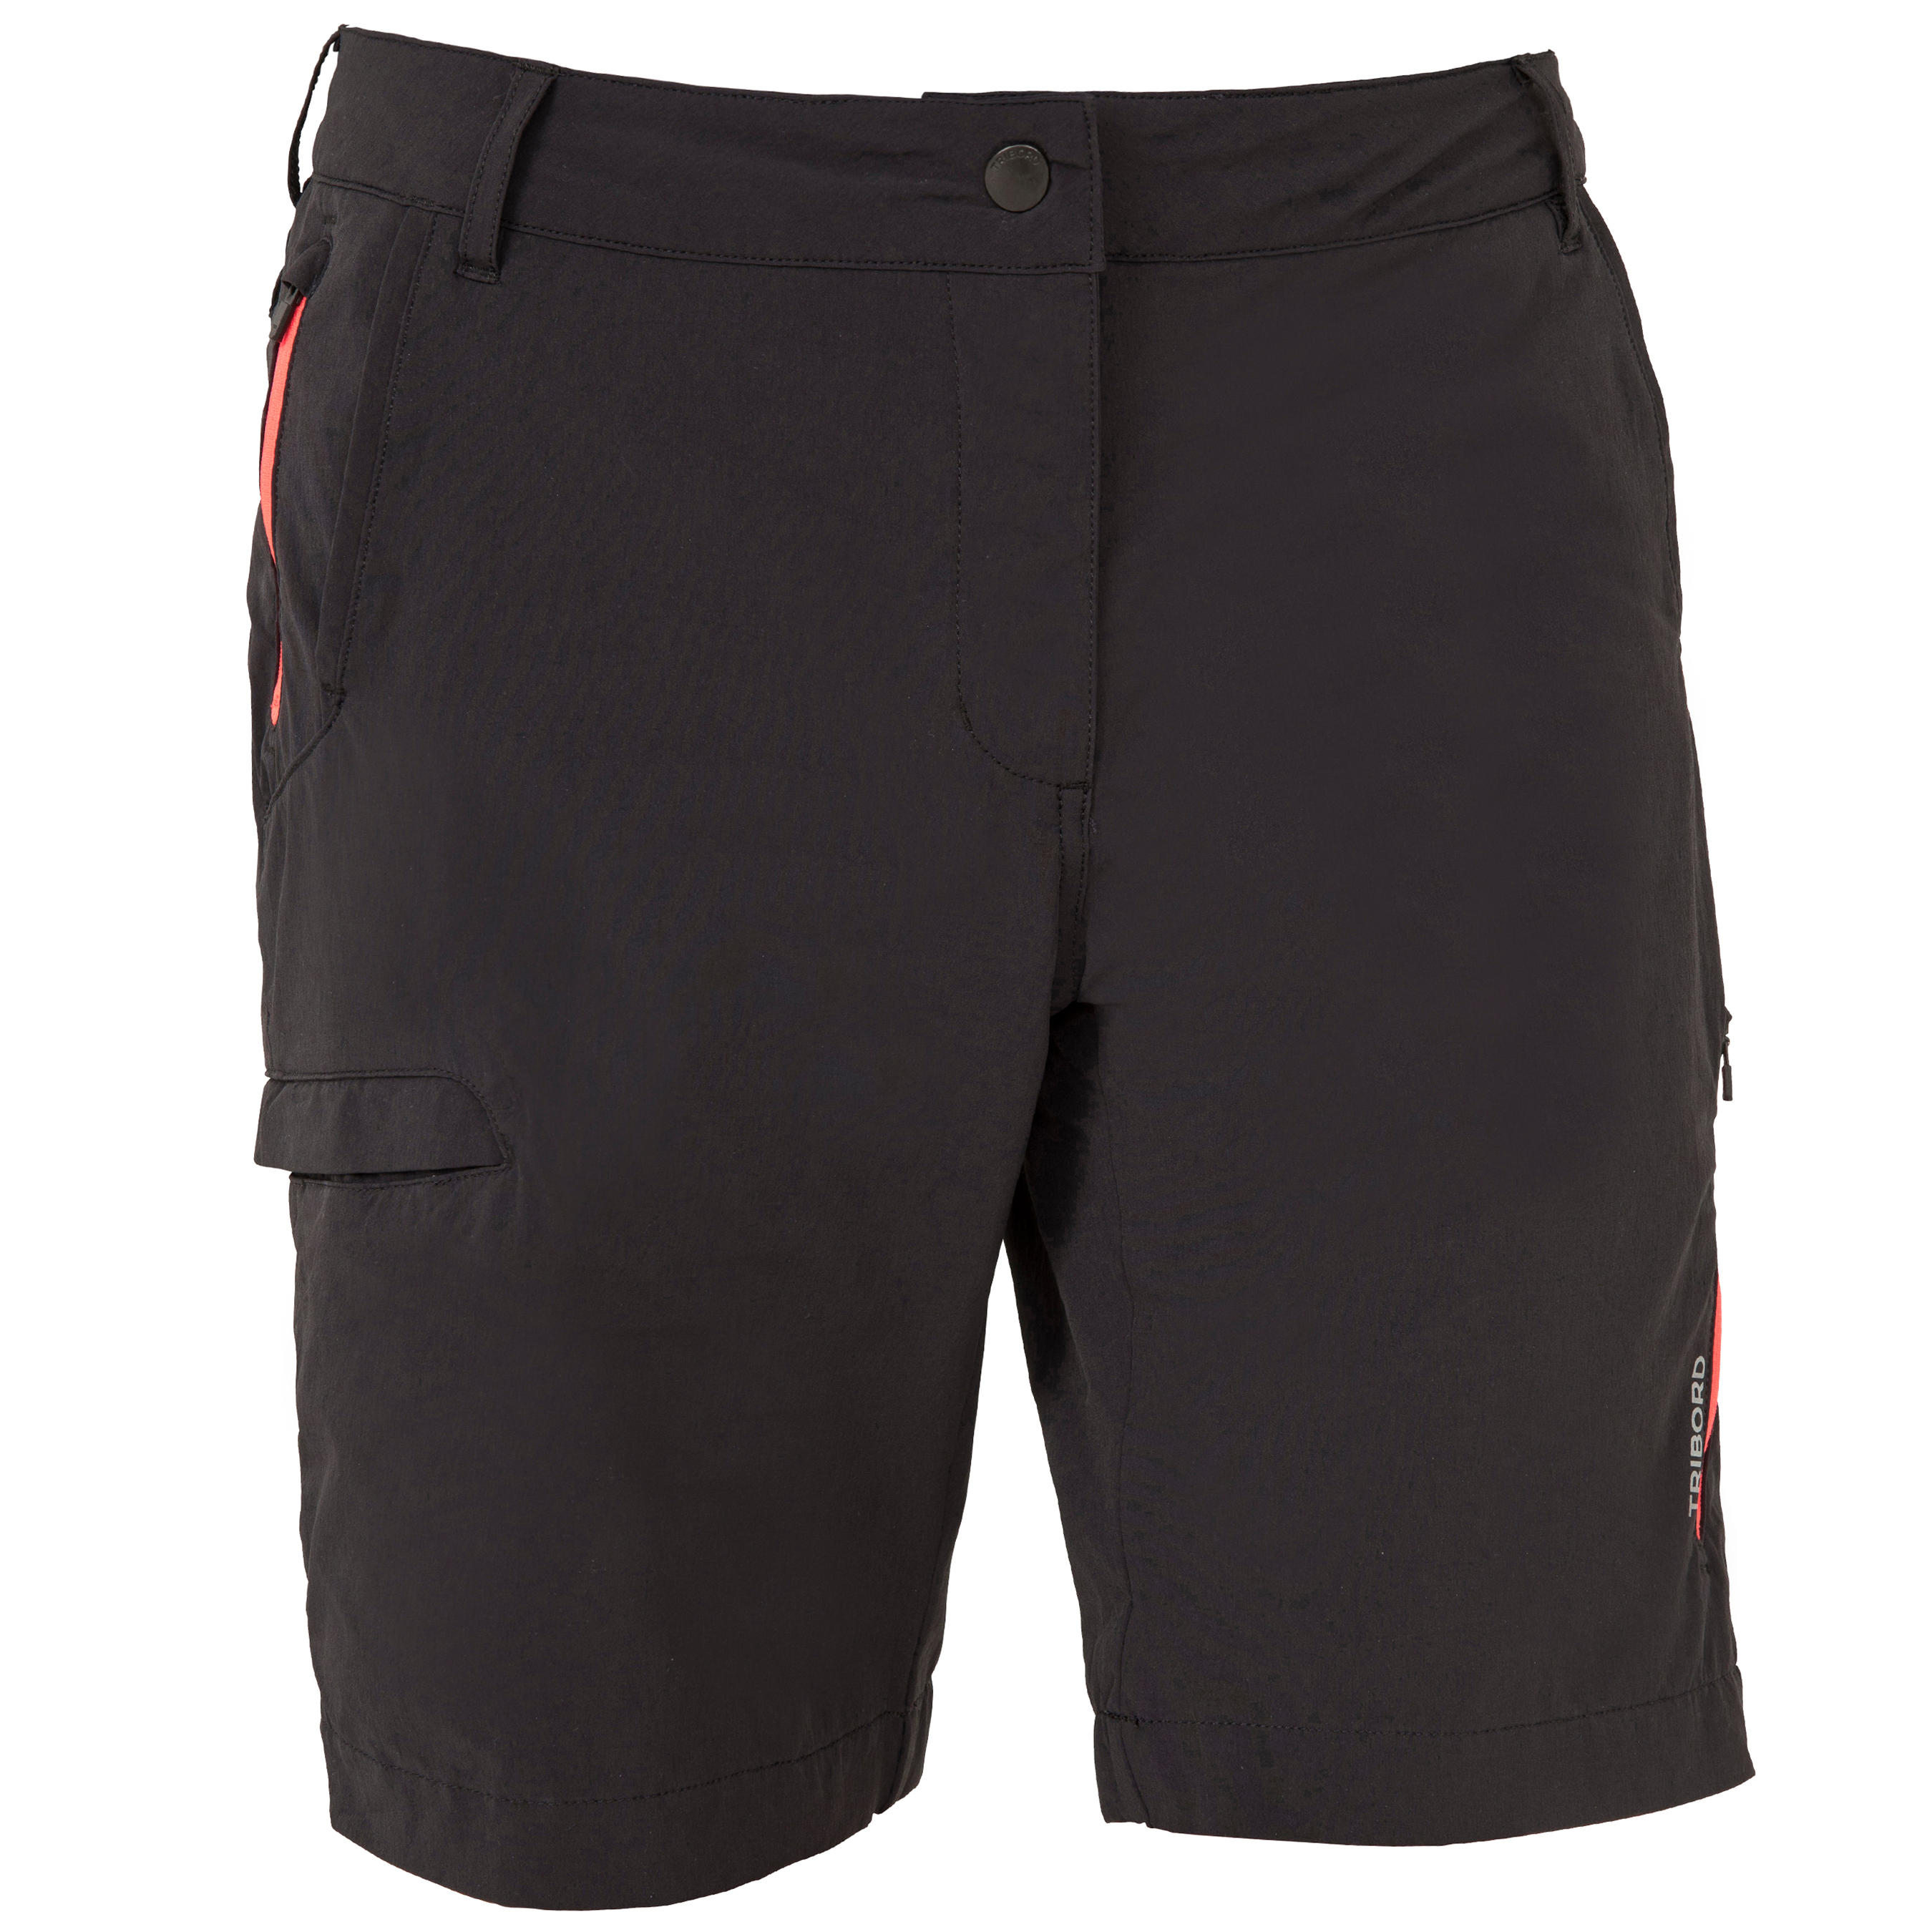 Race Women's Shorts...